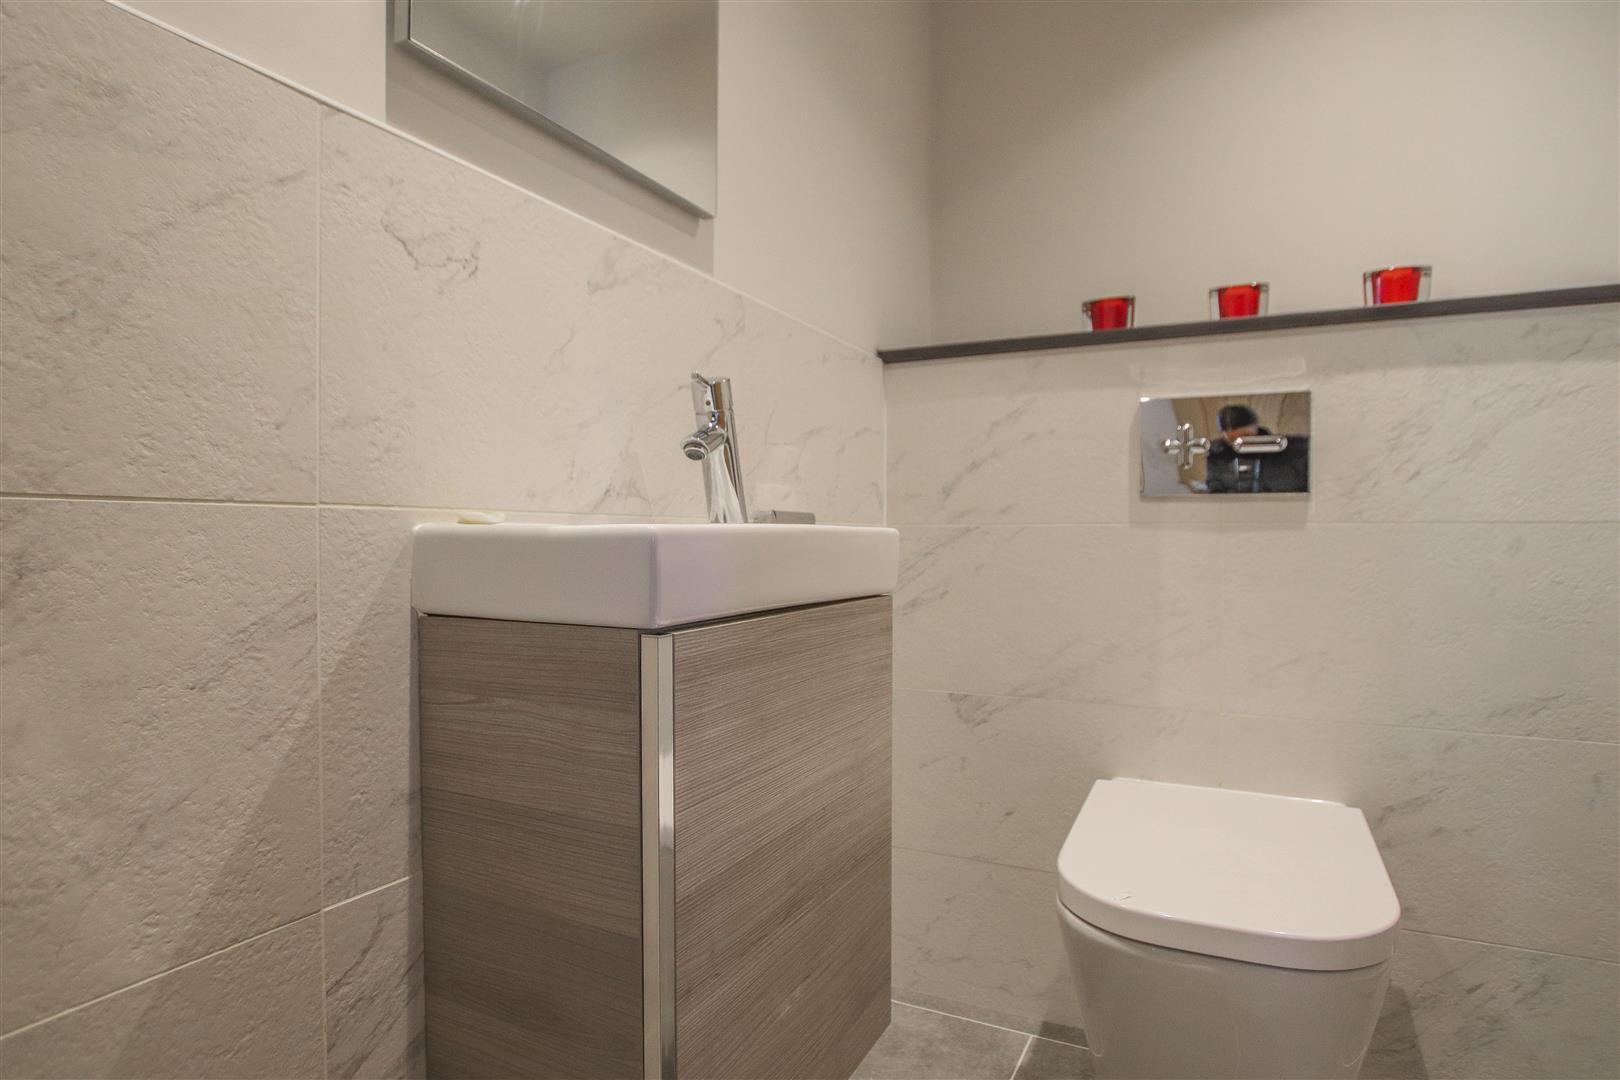 6 Bedroom Barn Conversion For Sale - 52.JPG